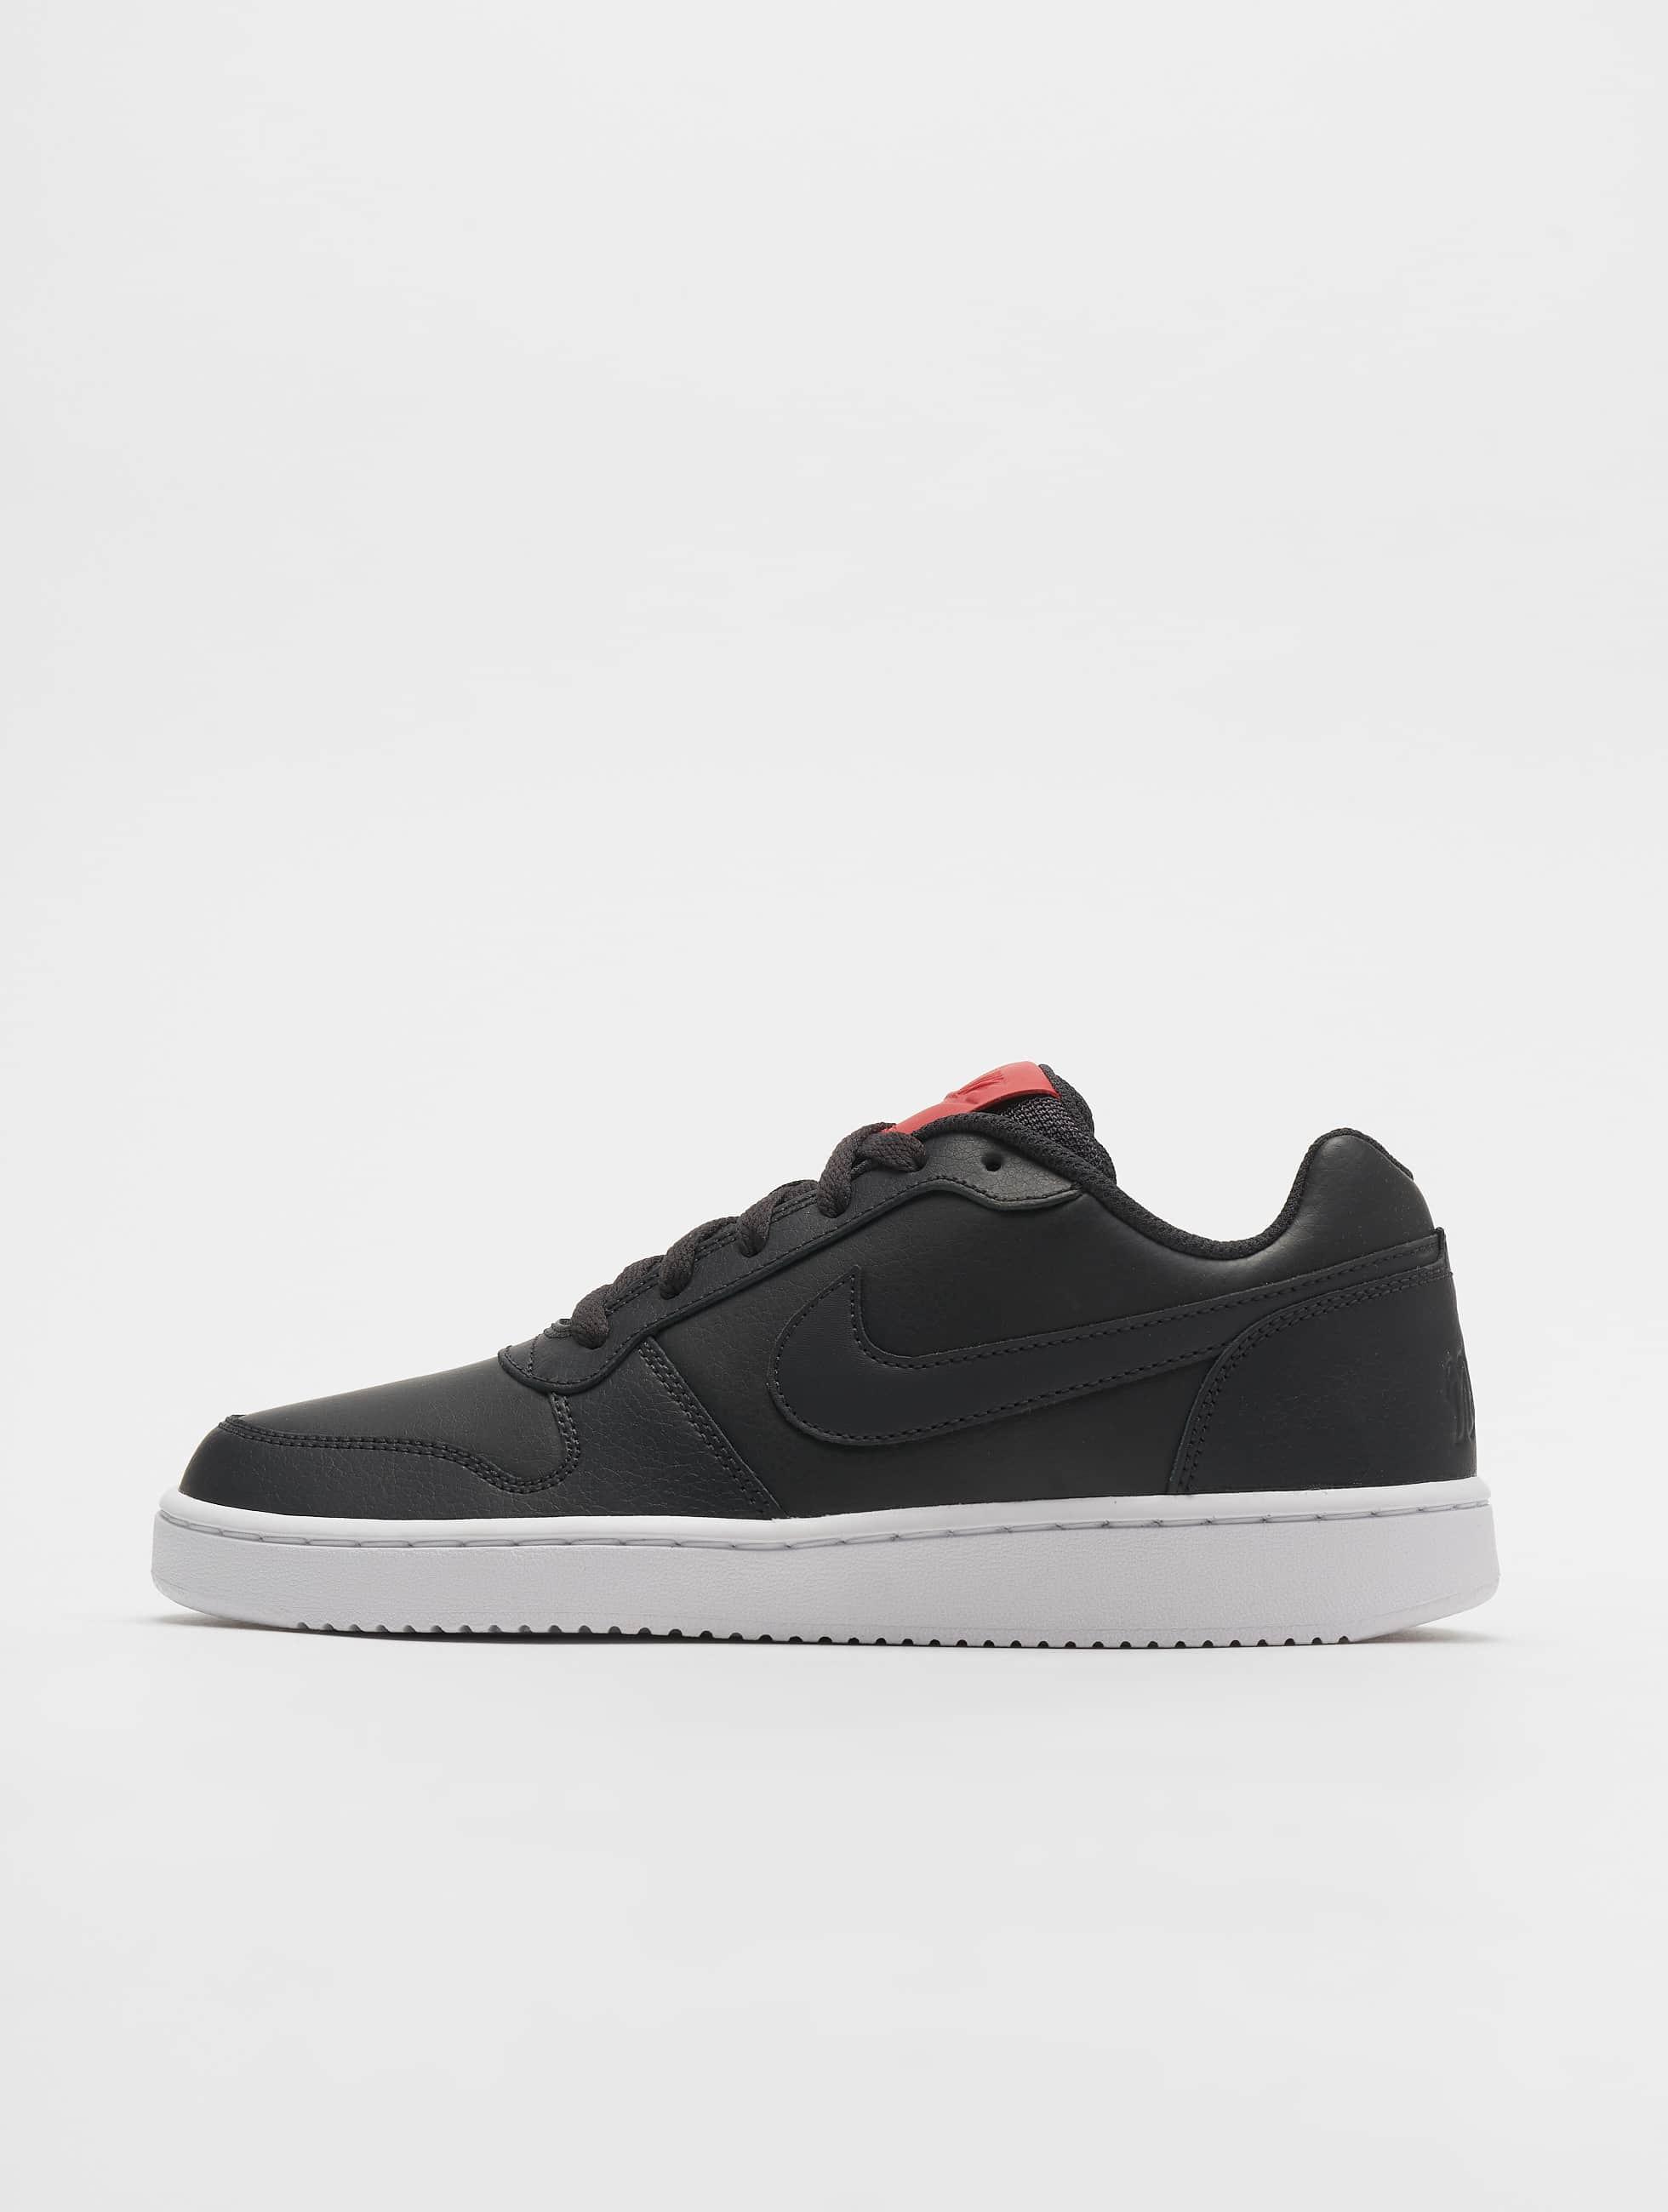 on sale ae6b0 c4166 Nike Skor   Sneakers Ebernon i grå 473100